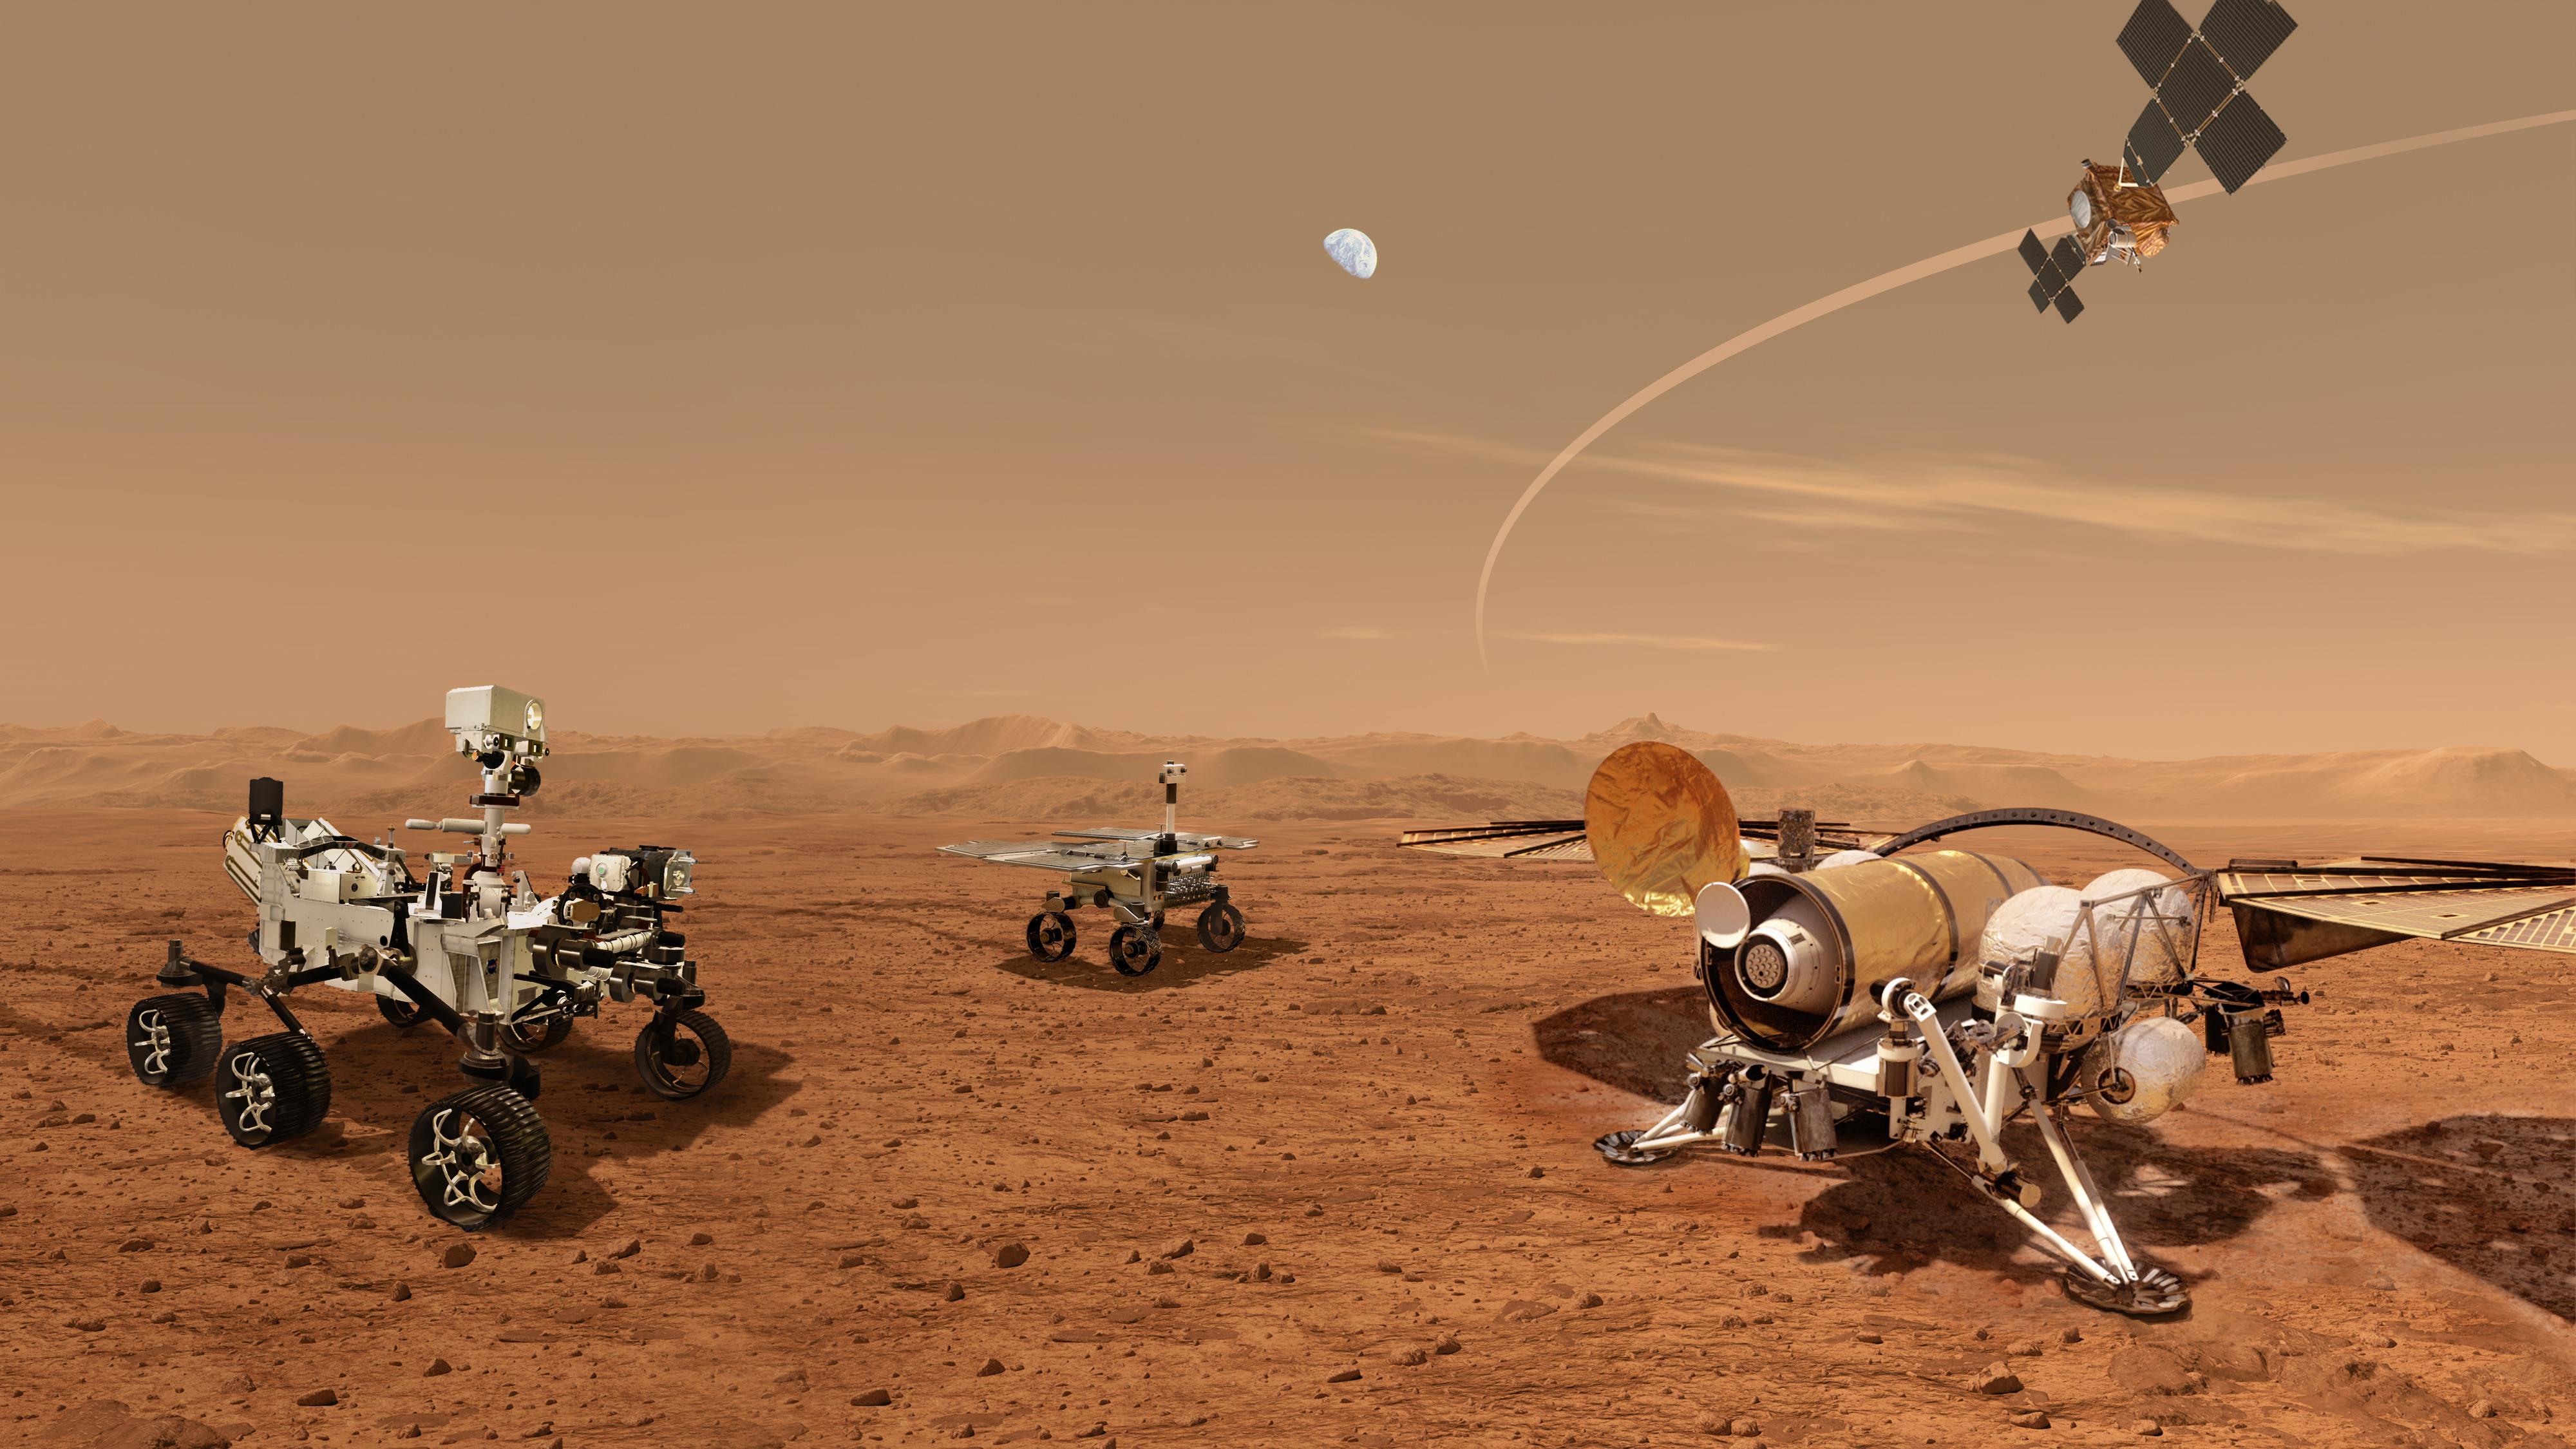 Mars Sample Return Artists Concept